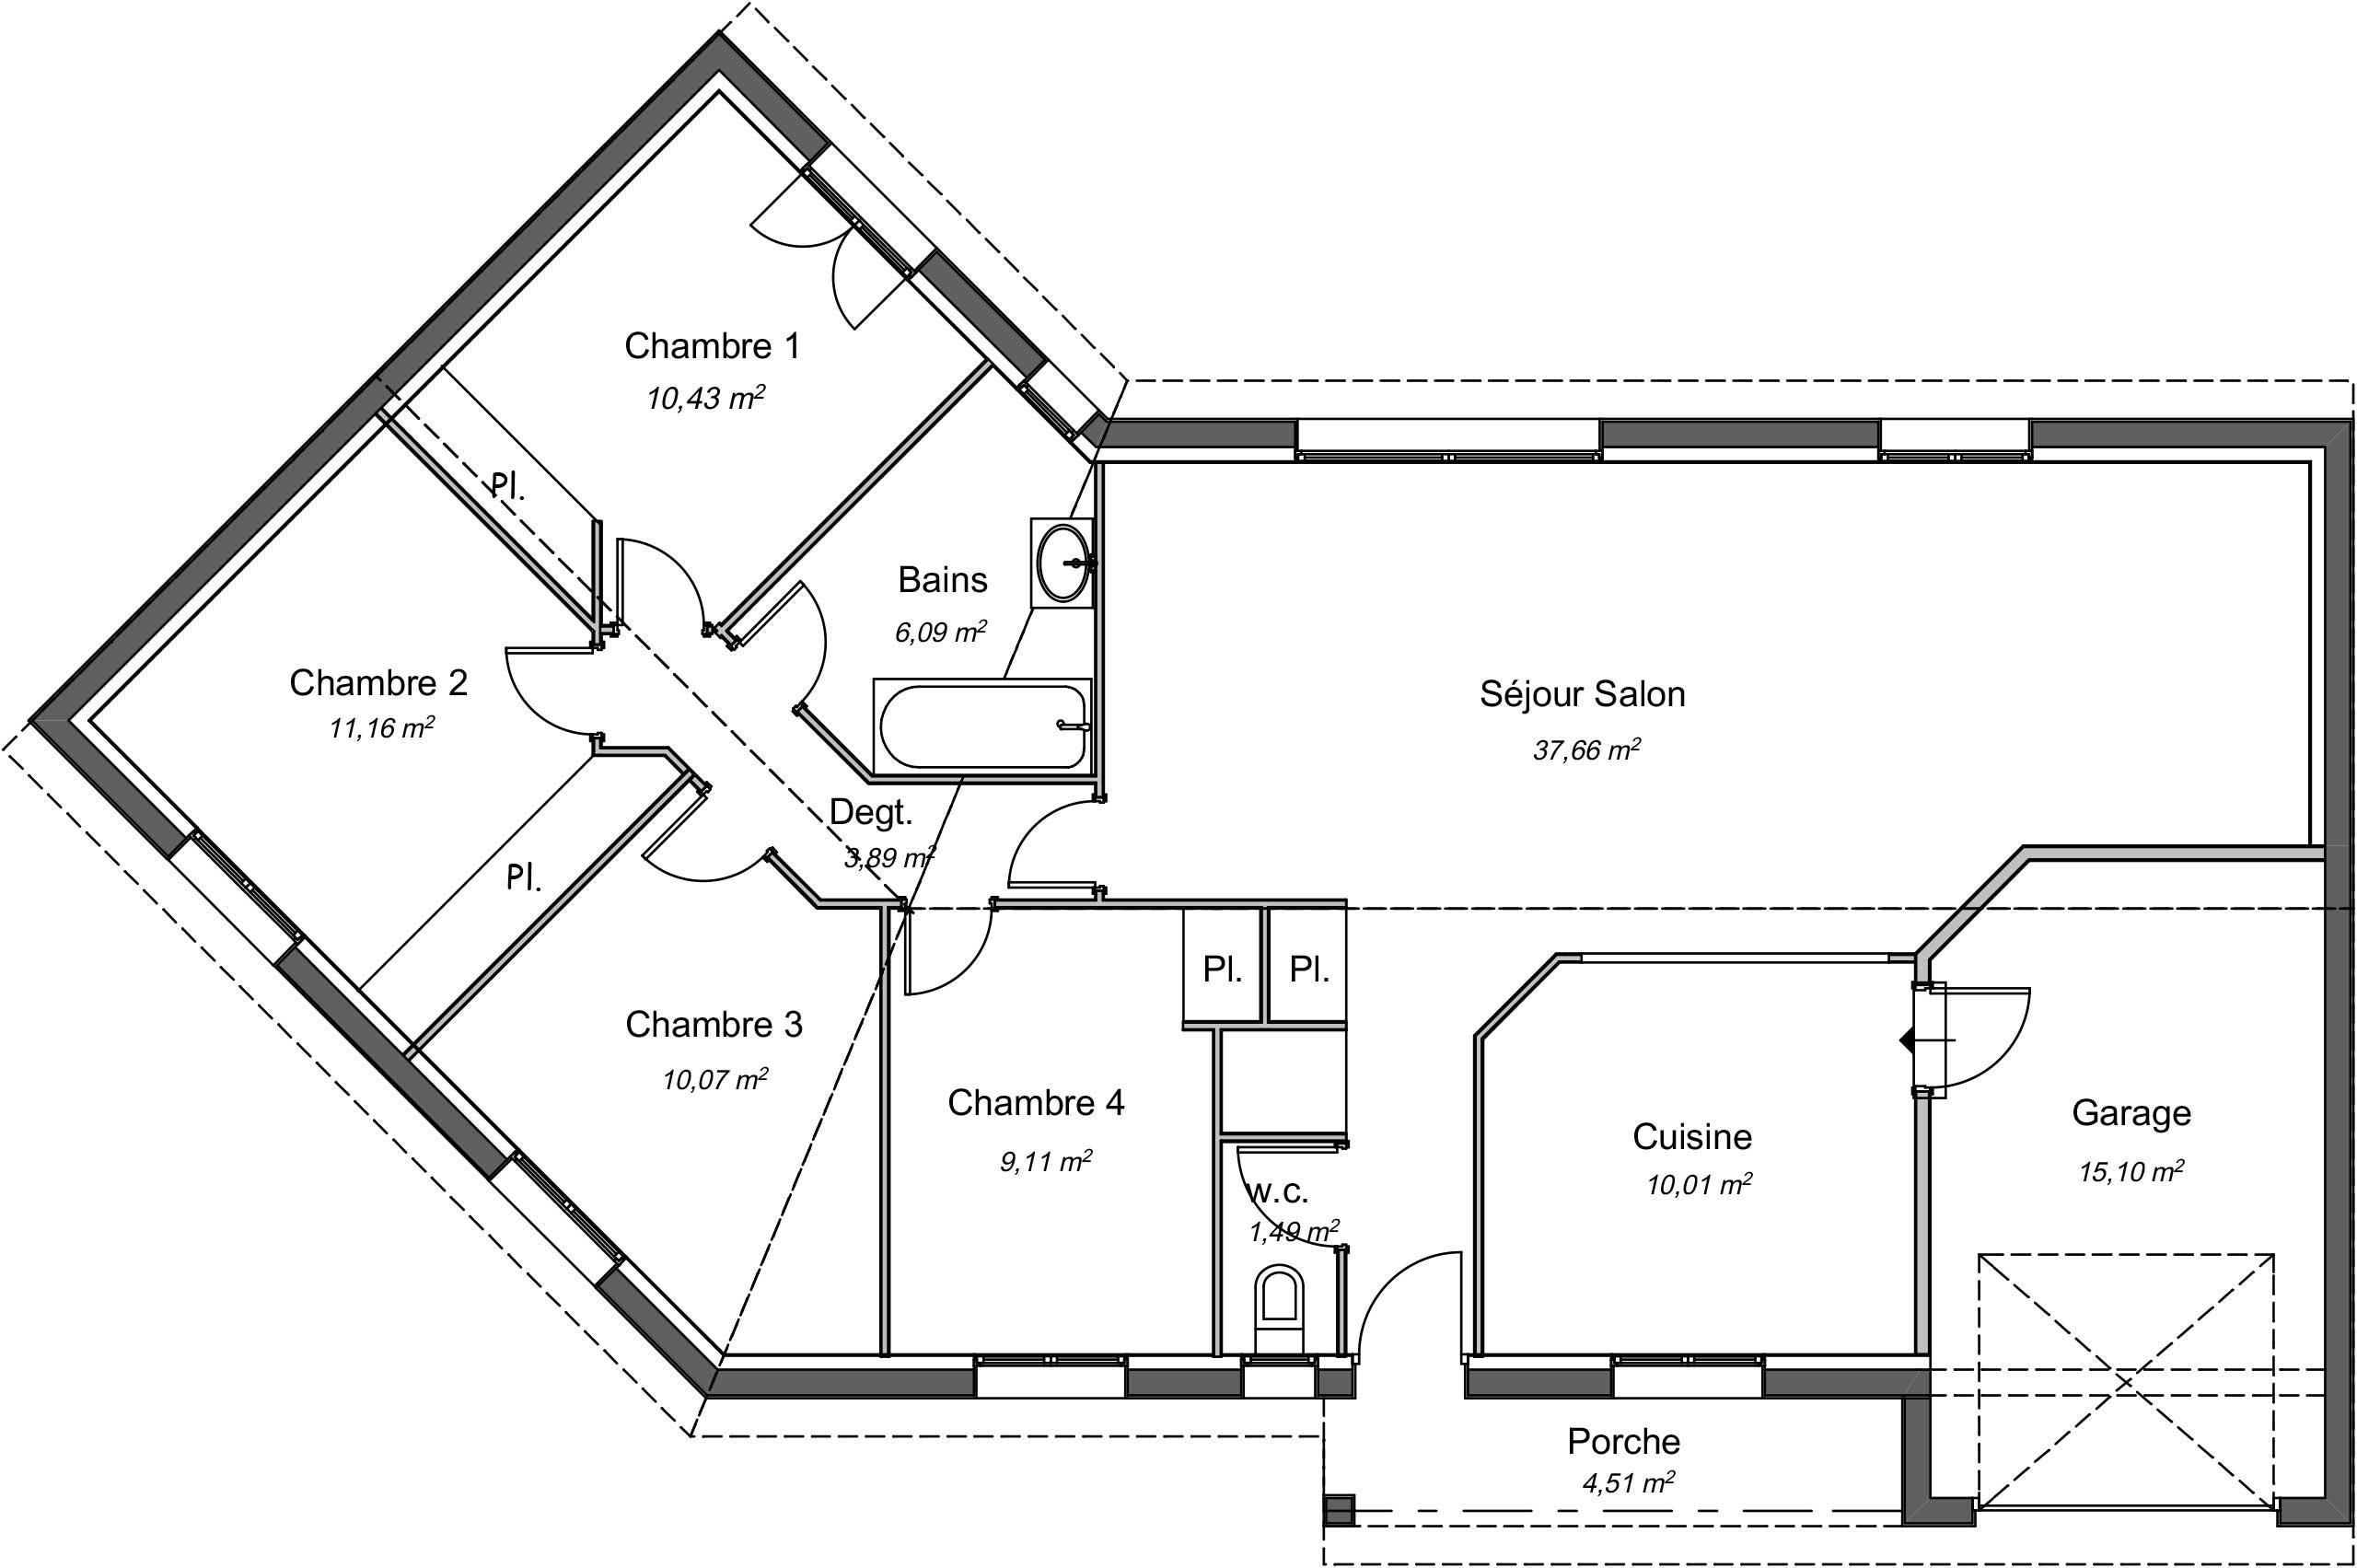 Construire sa maison Budos (33) Gironde - Constructeur Artigues-près-Bordeaux (33)